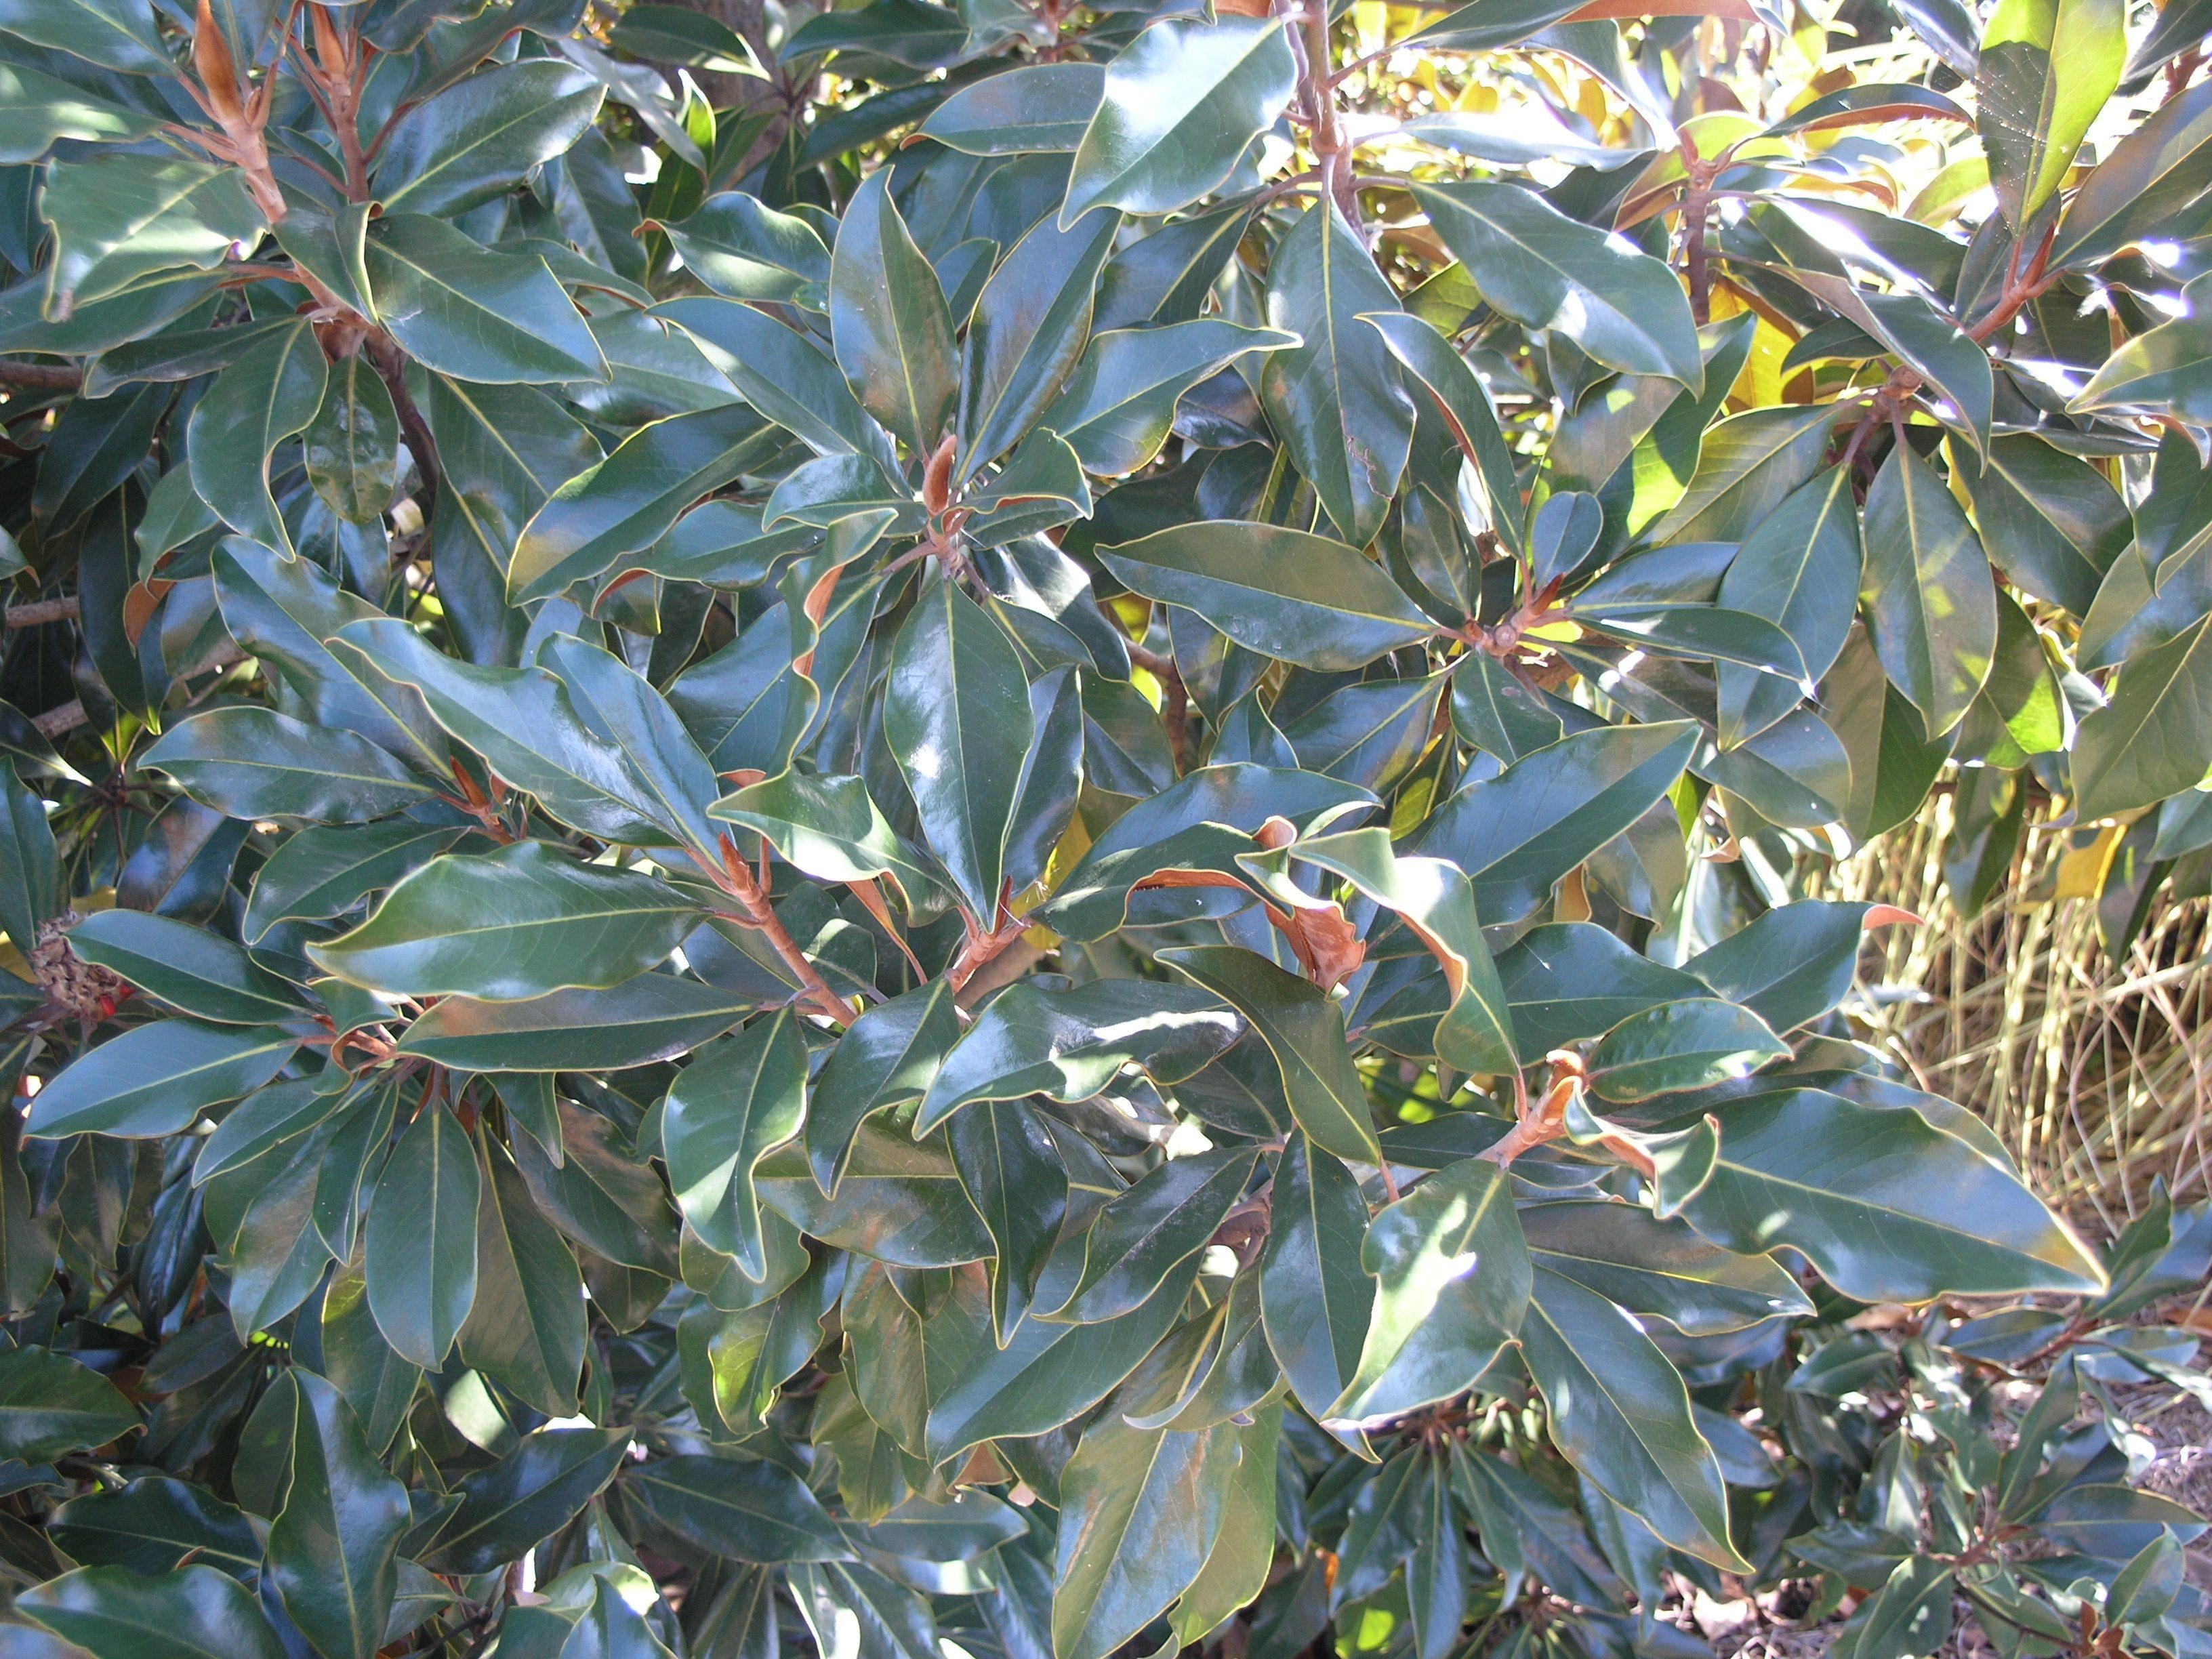 Kay Parris Magnolia Monrovia Kay Parris Magnolia Monrovia Plants Monrovia Hardscape